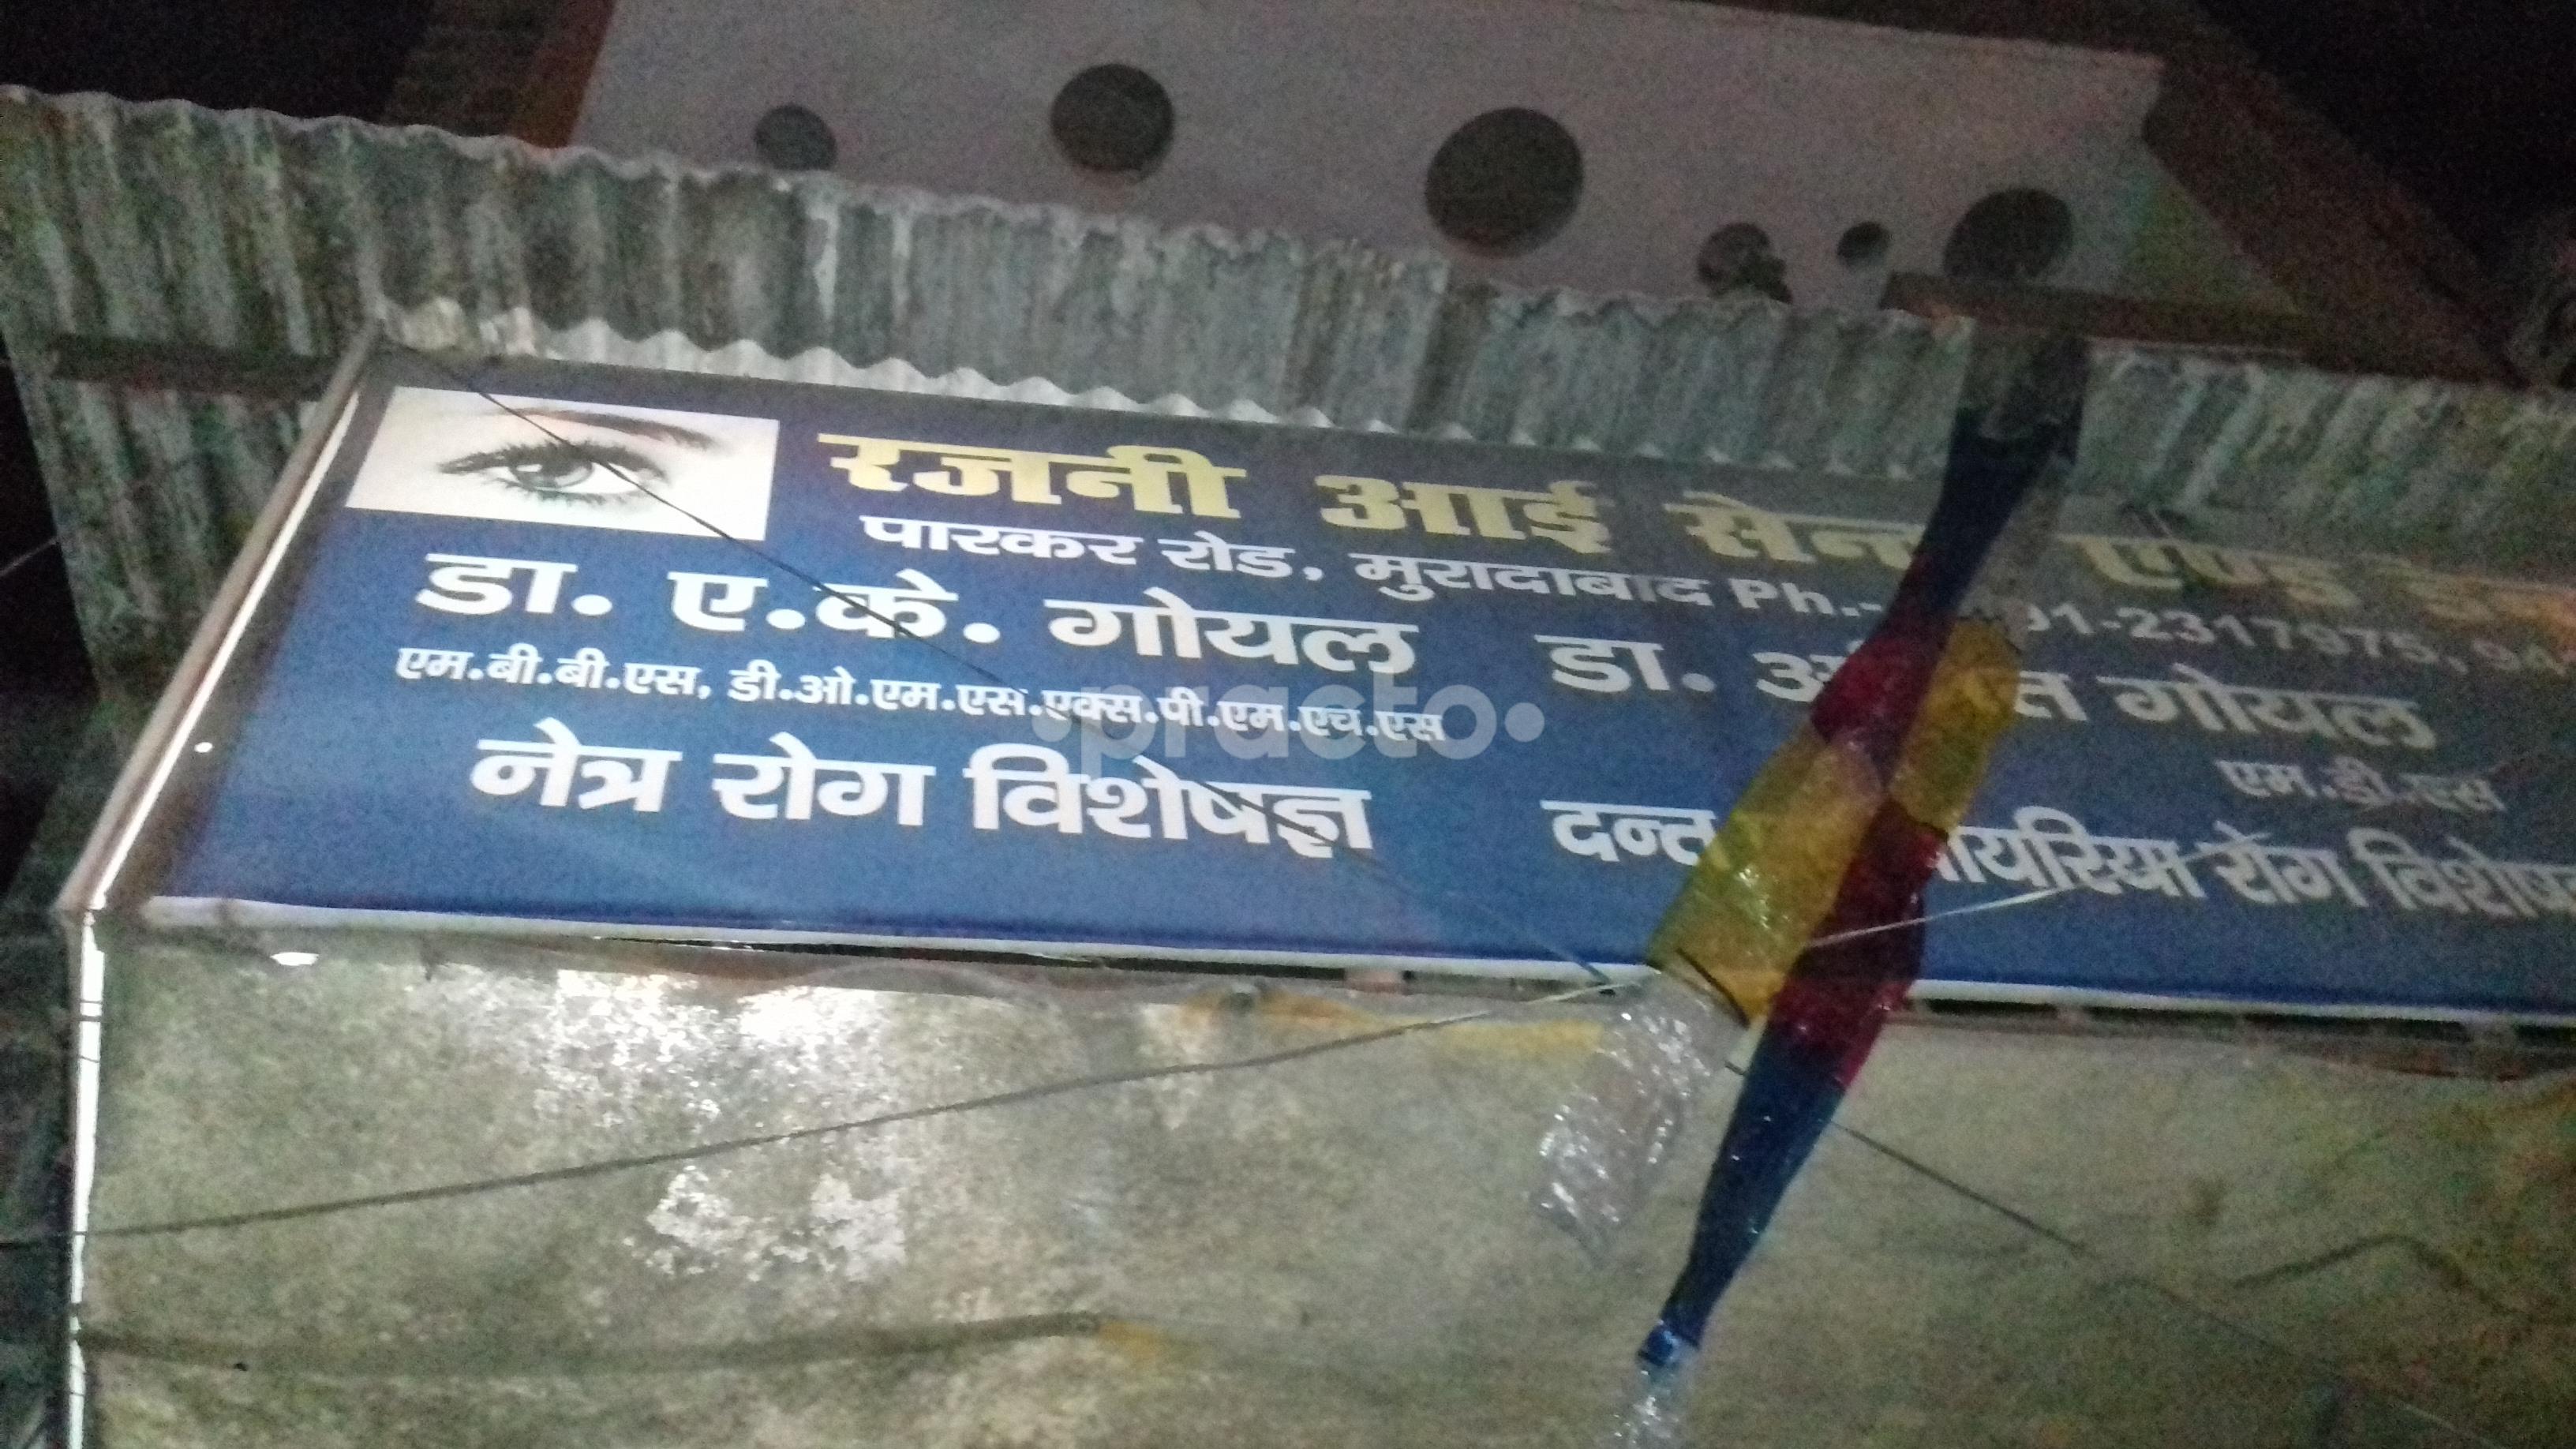 Rajani Eye Centre and Dental Clinic